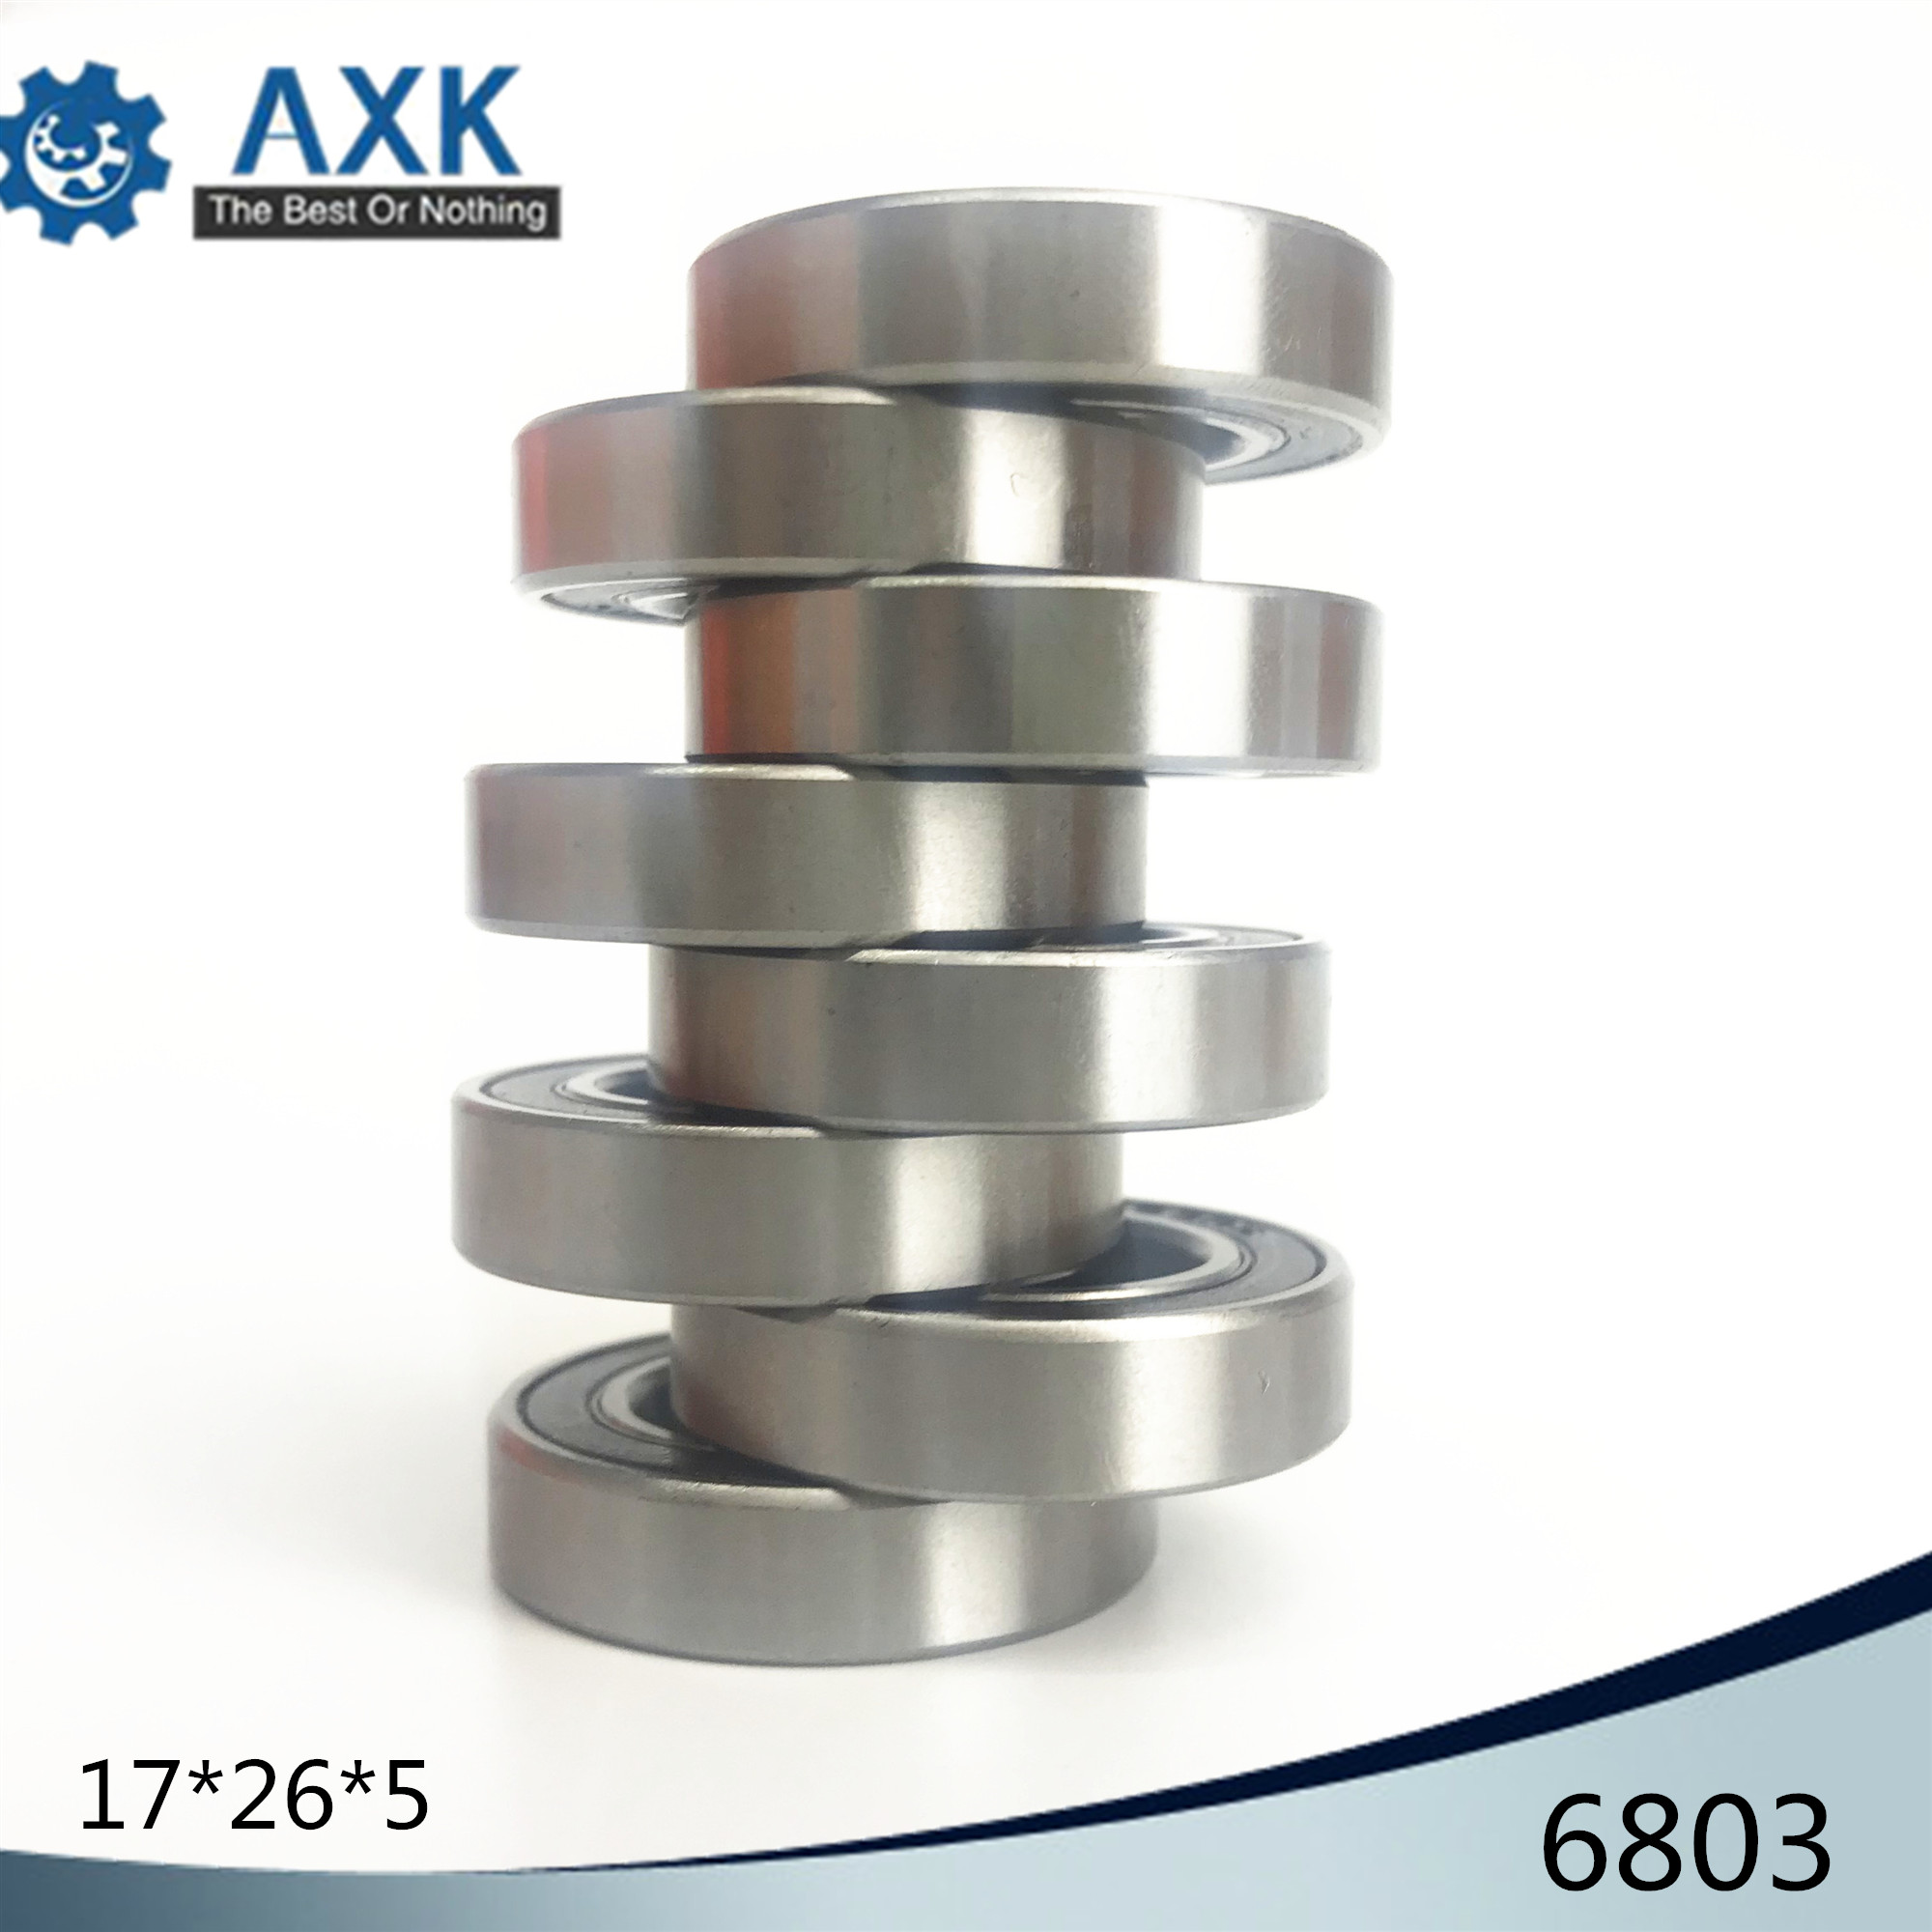 6803 Hybrid Ceramic Bearing 17x26x5 mm ABEC-1 ( 1 PC ) Bicycle Bottom Brackets & Spares 6803RS Si3N4 Ball Bearings6803 Hybrid Ceramic Bearing 17x26x5 mm ABEC-1 ( 1 PC ) Bicycle Bottom Brackets & Spares 6803RS Si3N4 Ball Bearings